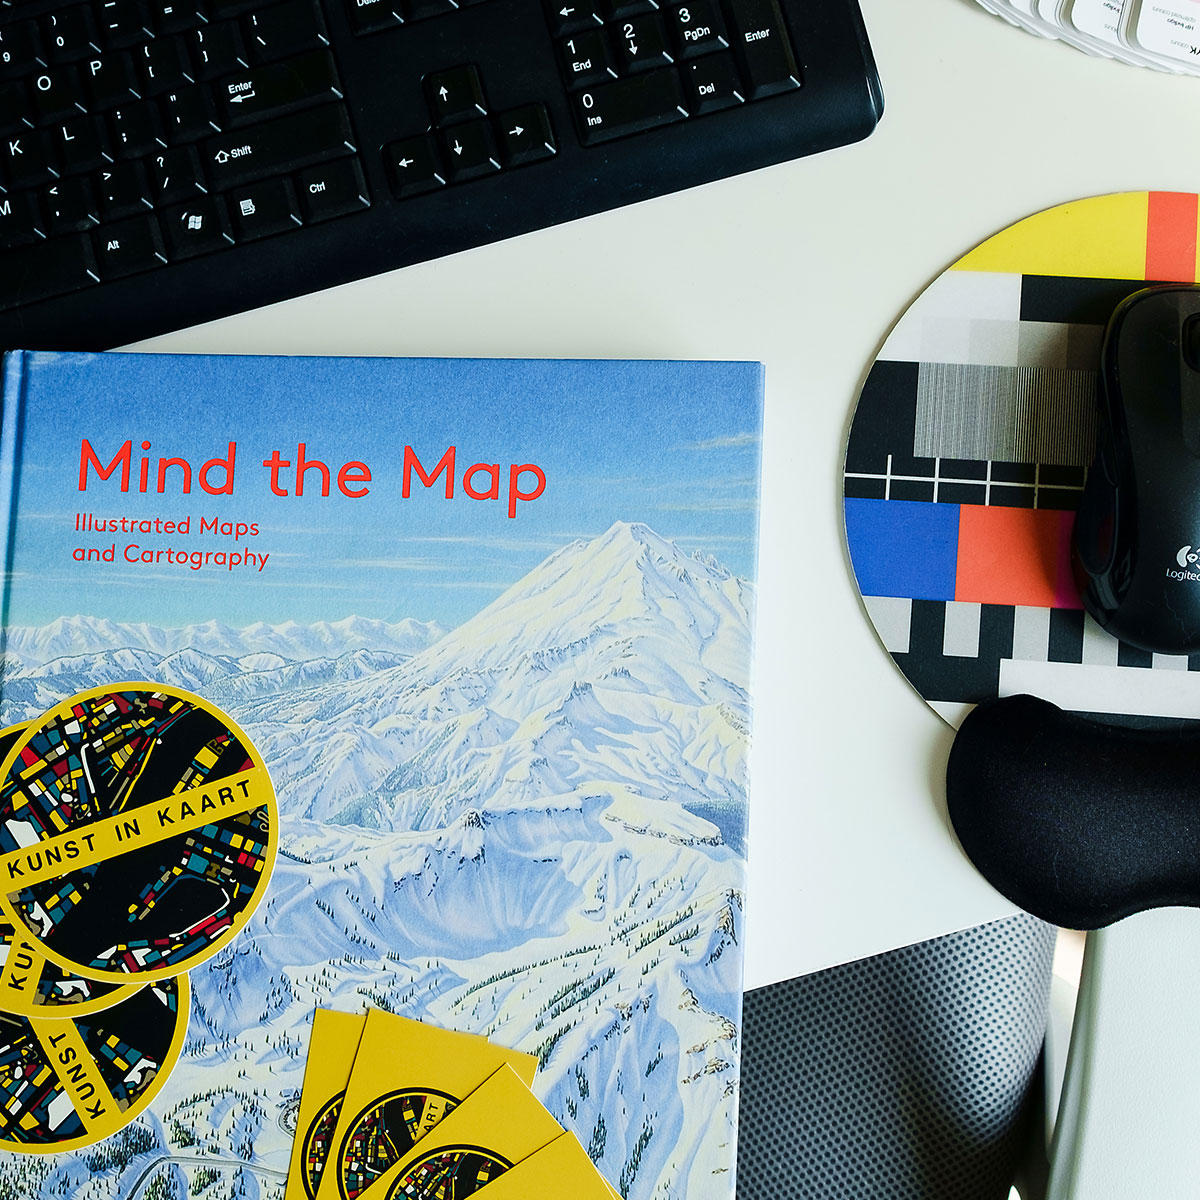 kunst-in-kaart-mind-the-map